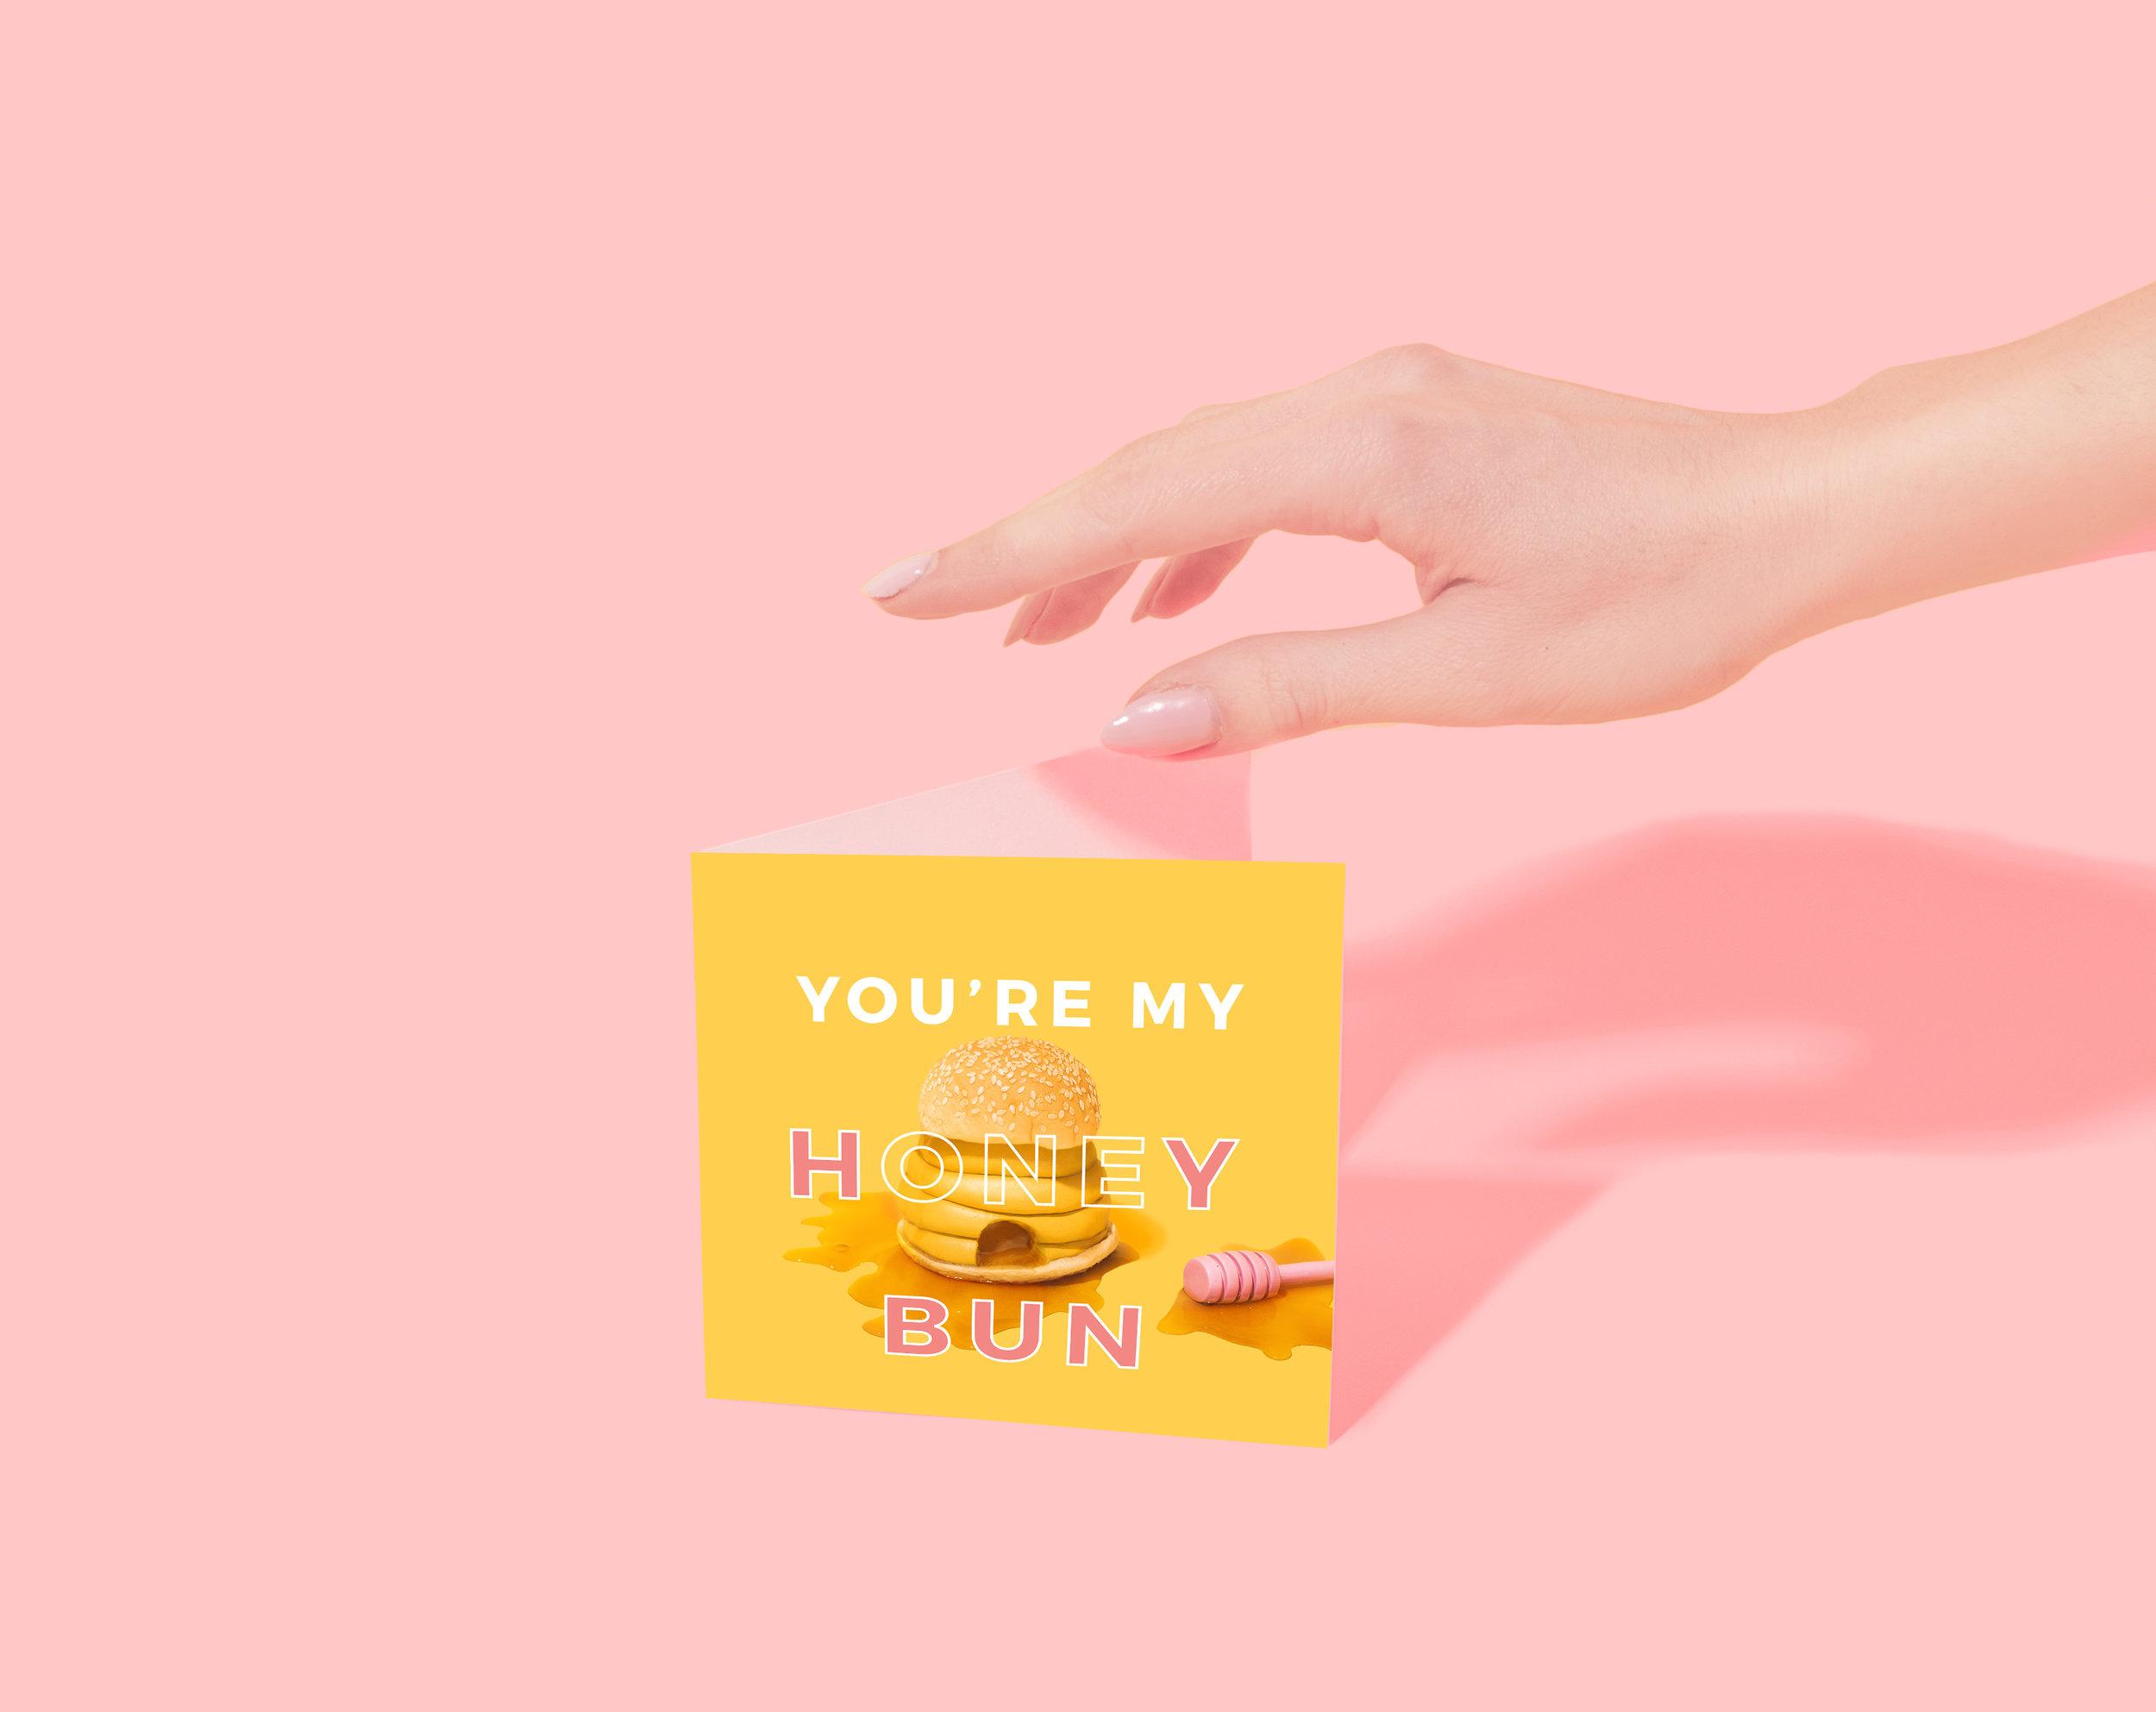 2. You're My Honey Bun